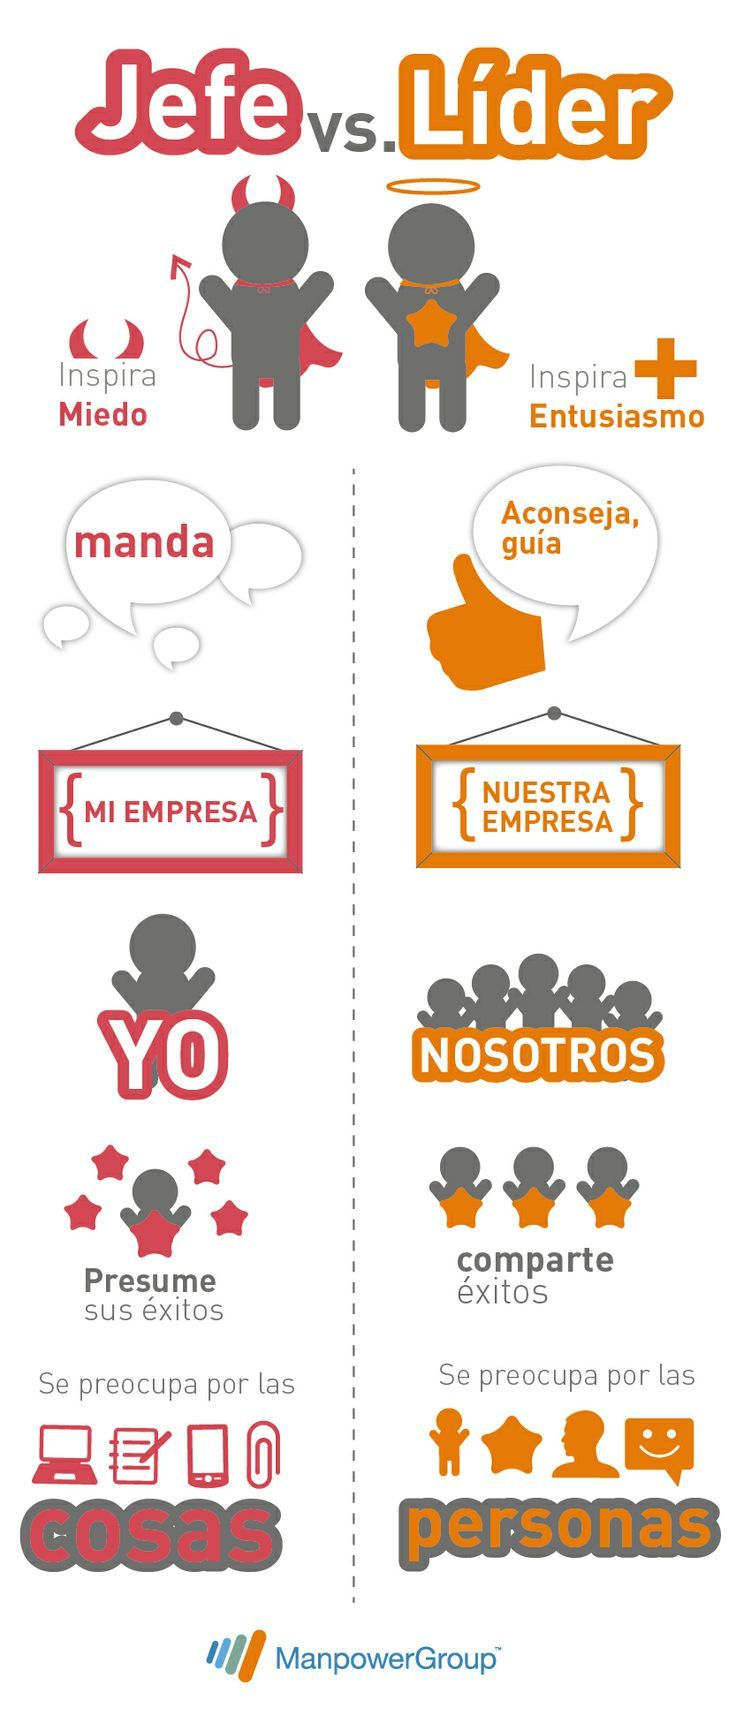 Jefe vs. Líder #Jefe #Liderazgo